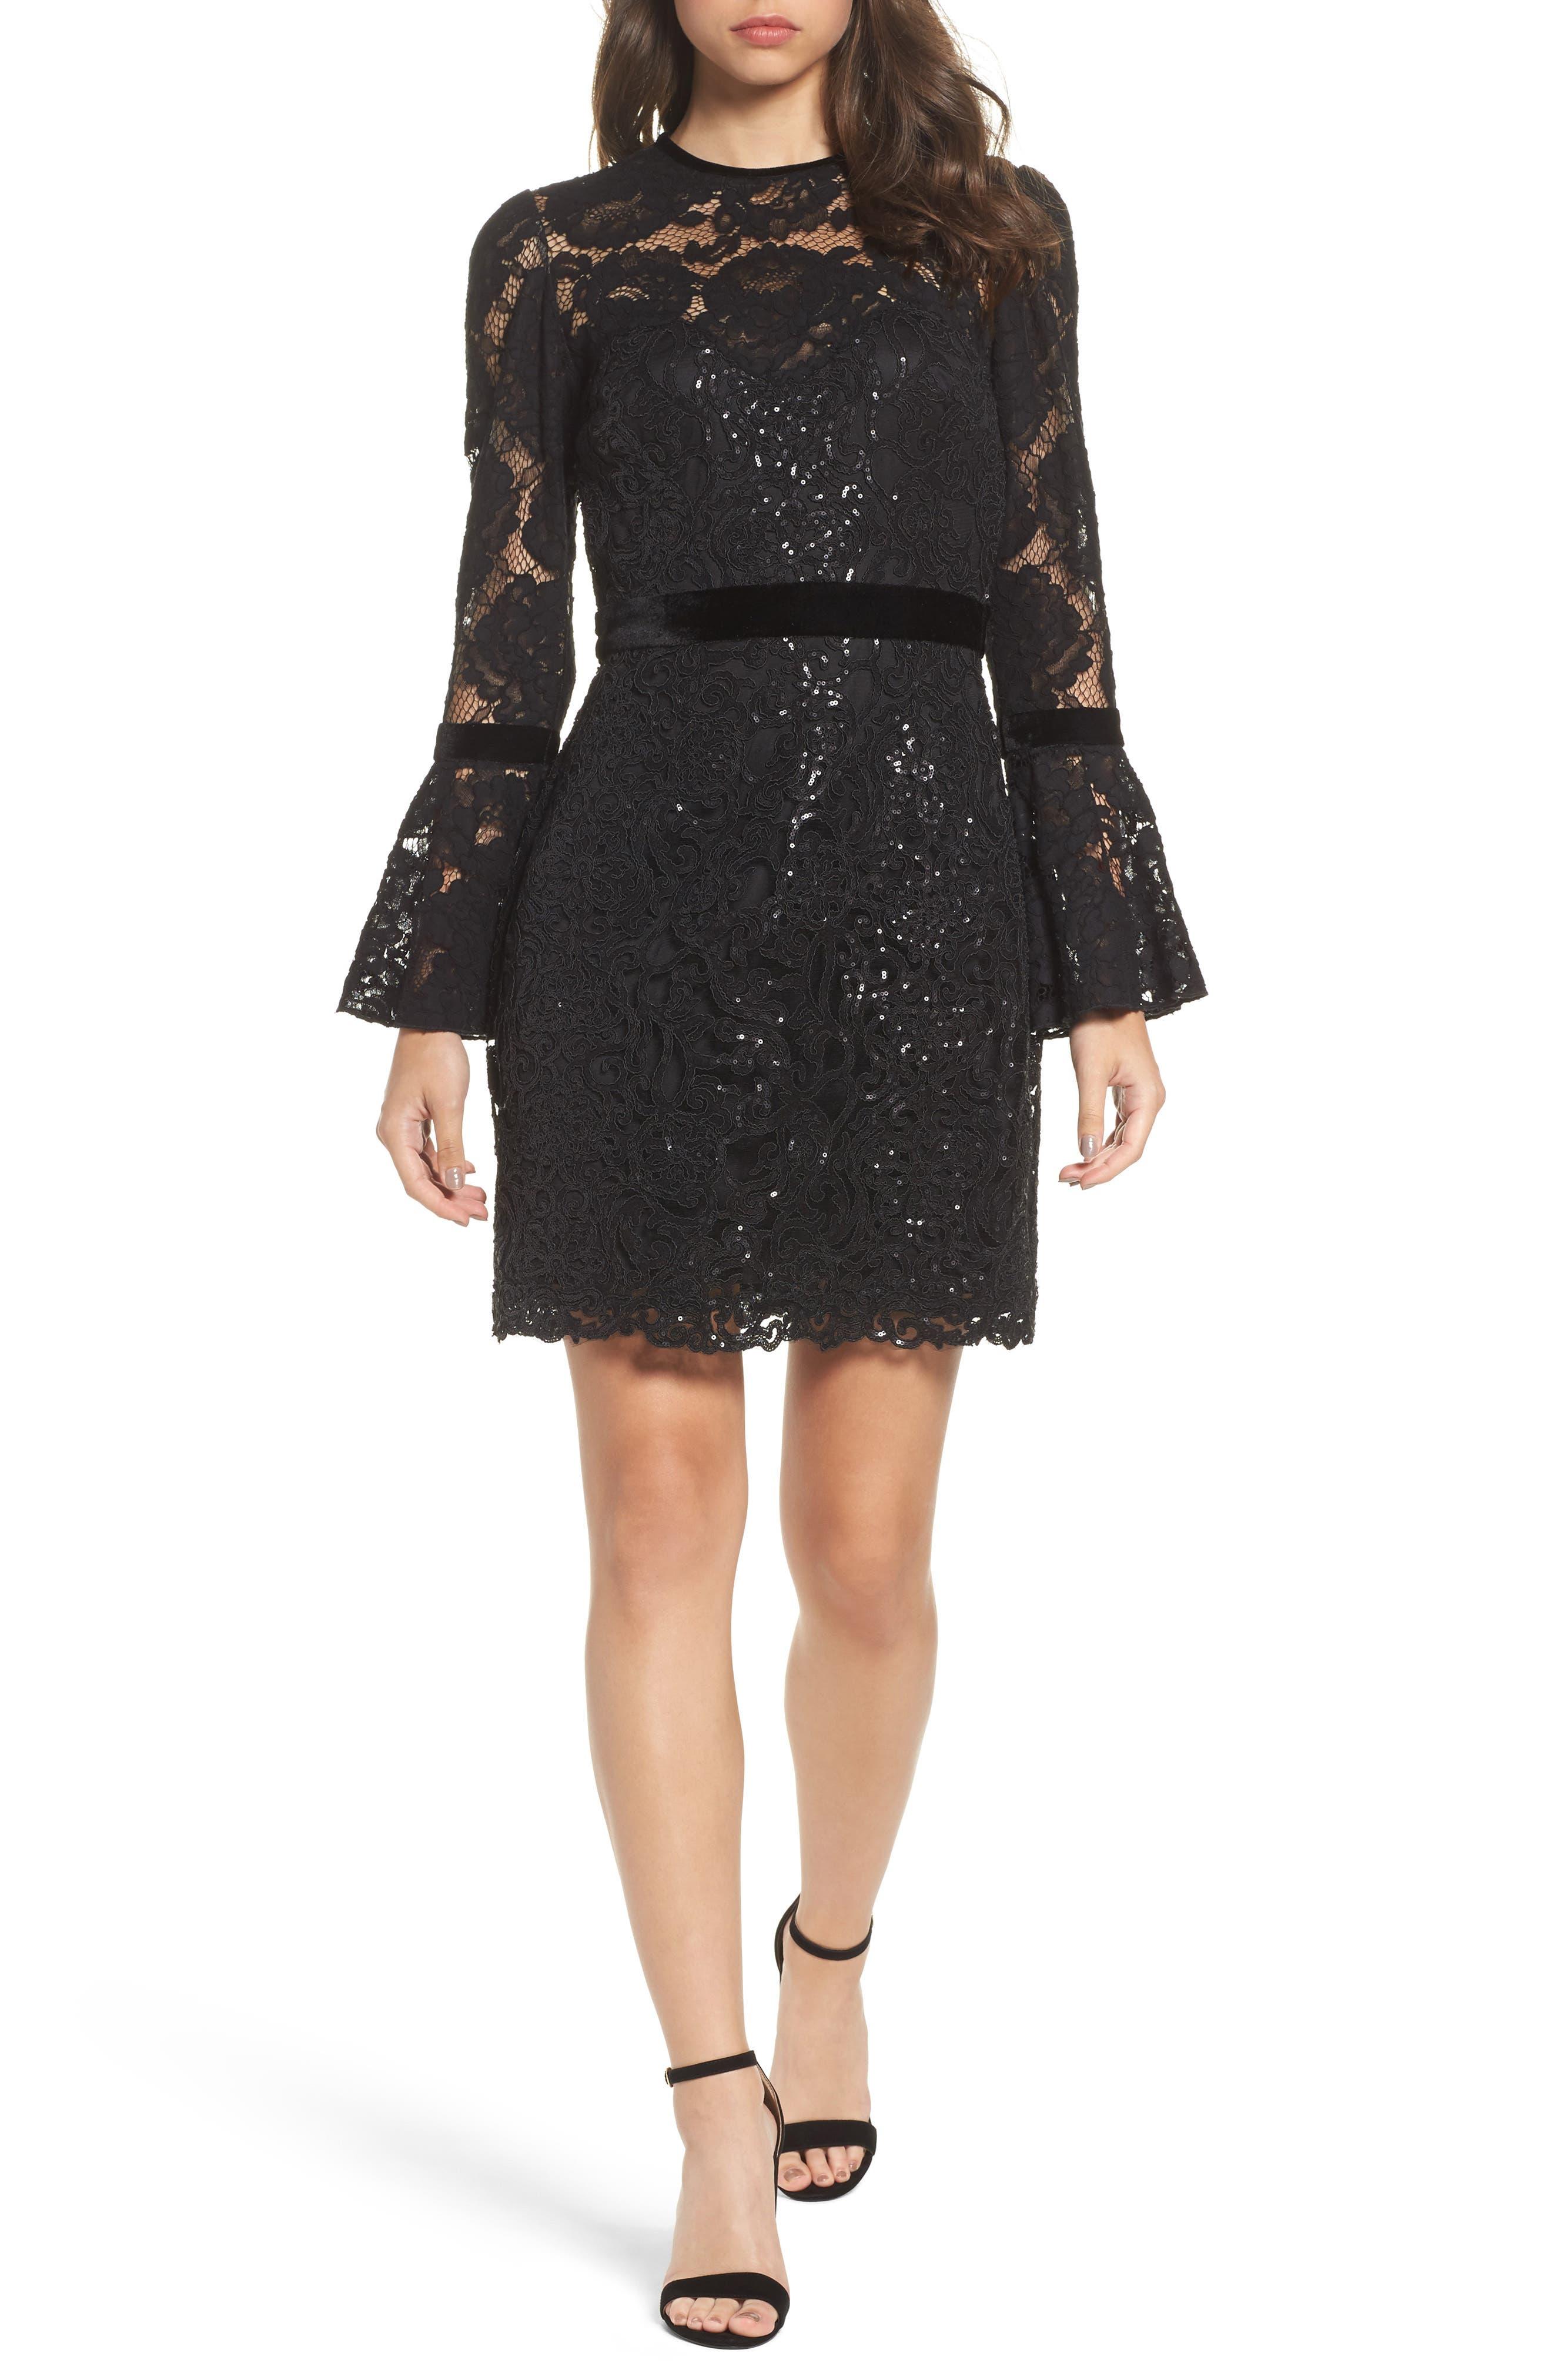 Alternate Image 1 Selected - Tadashi Shoji Bell Sleeve Rose & Sequin Lace Dress